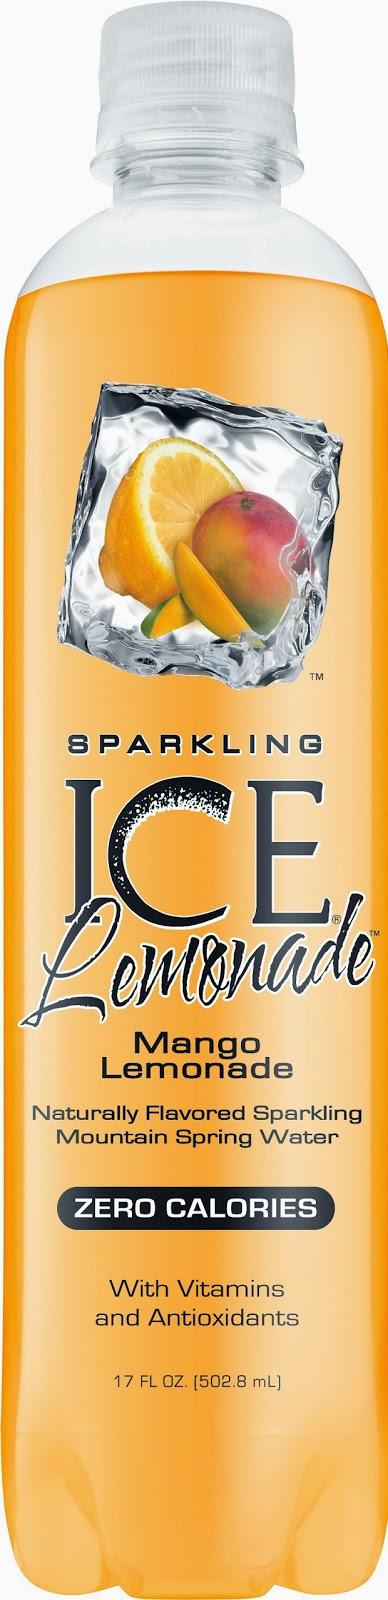 SparklingICE Mango Lemonade